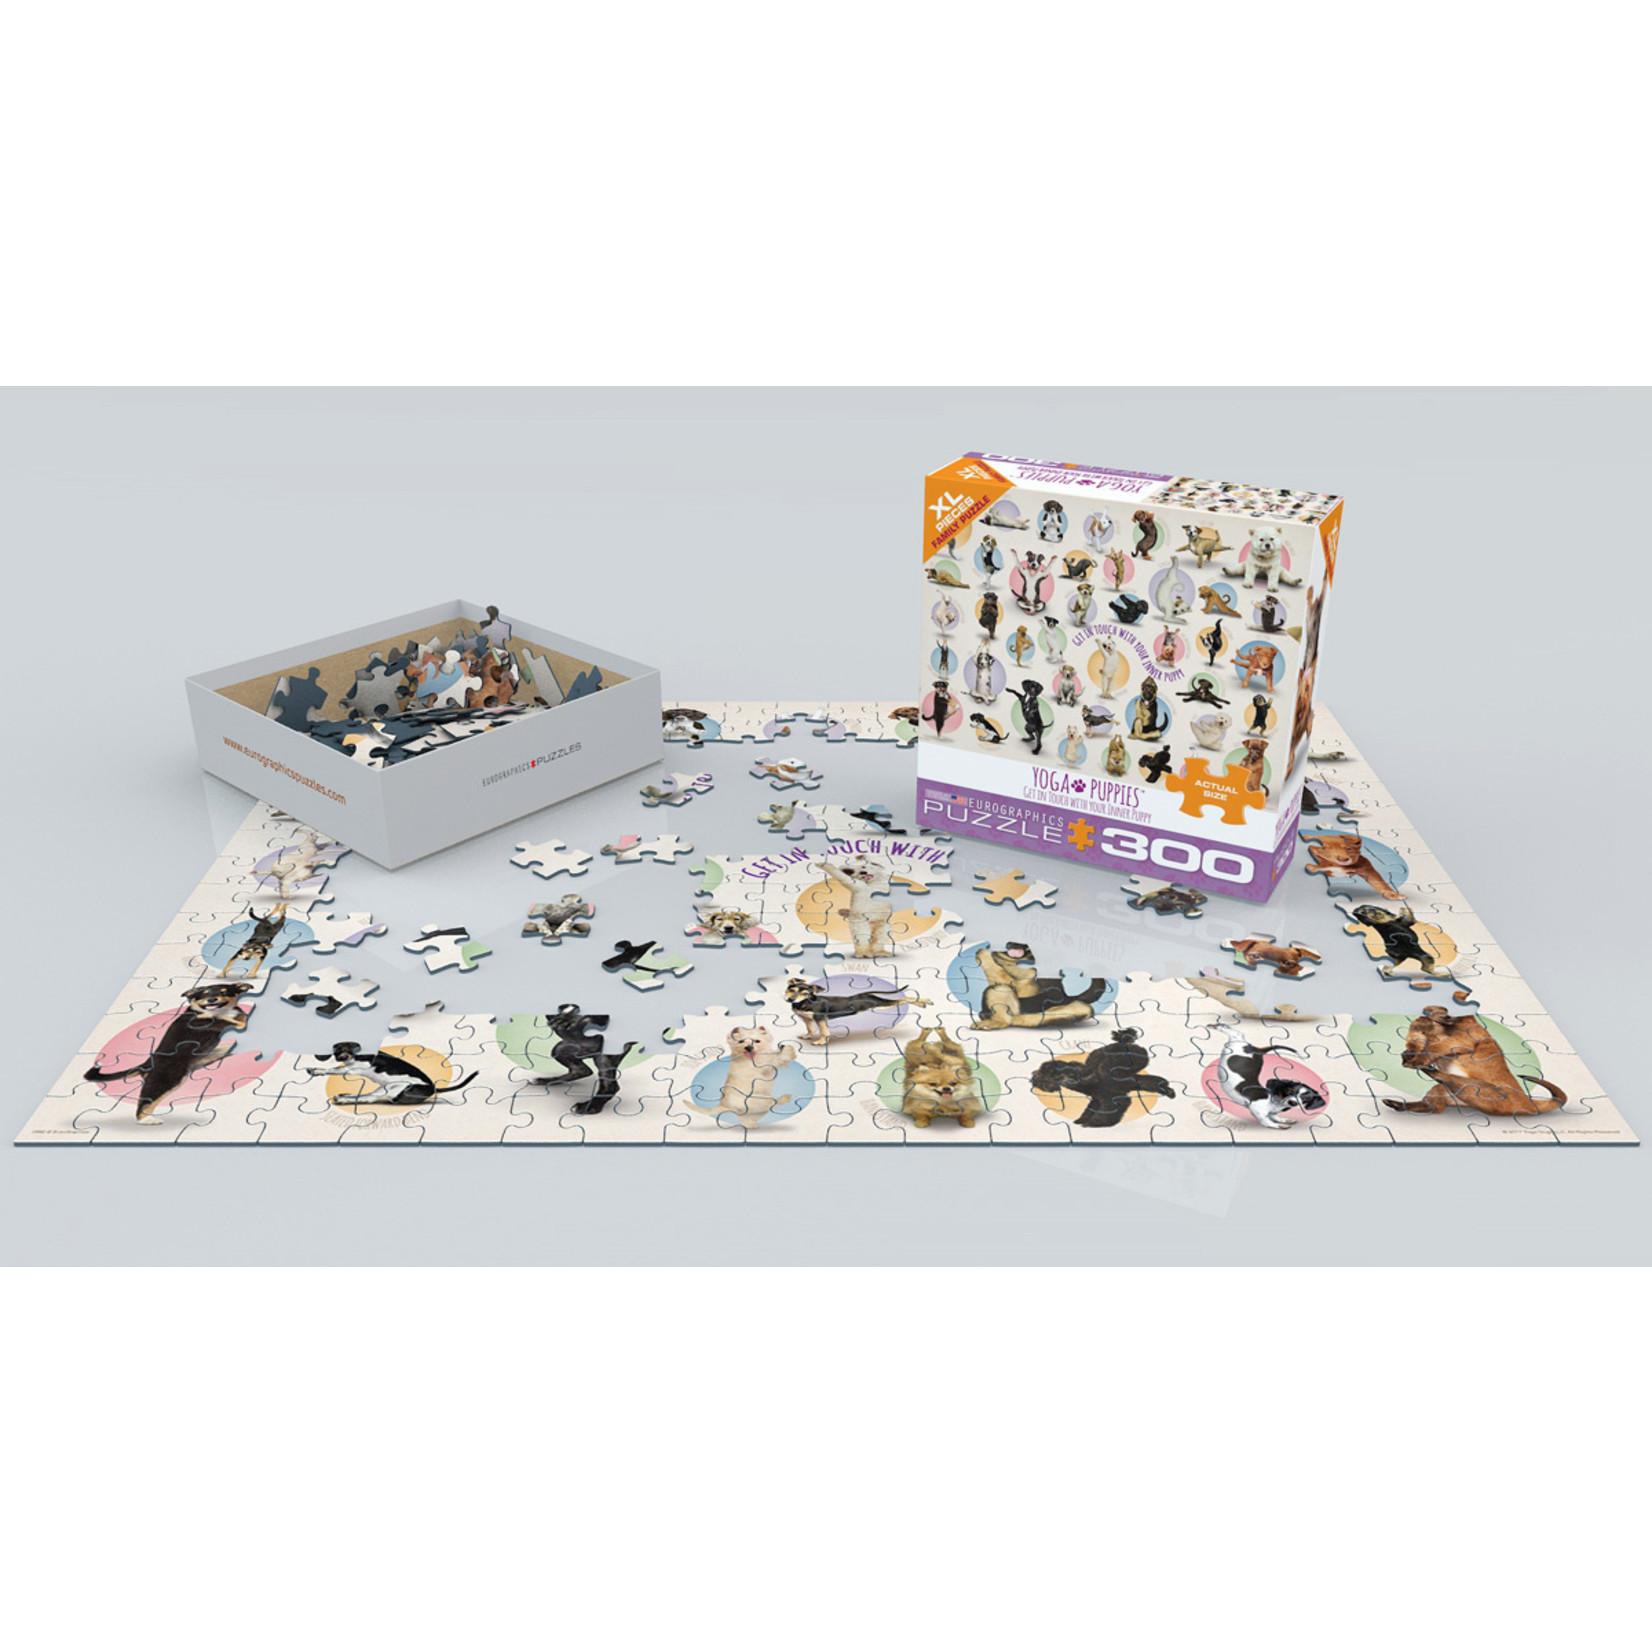 EuroGraphics Puzzles Yoga Puppies 300pc